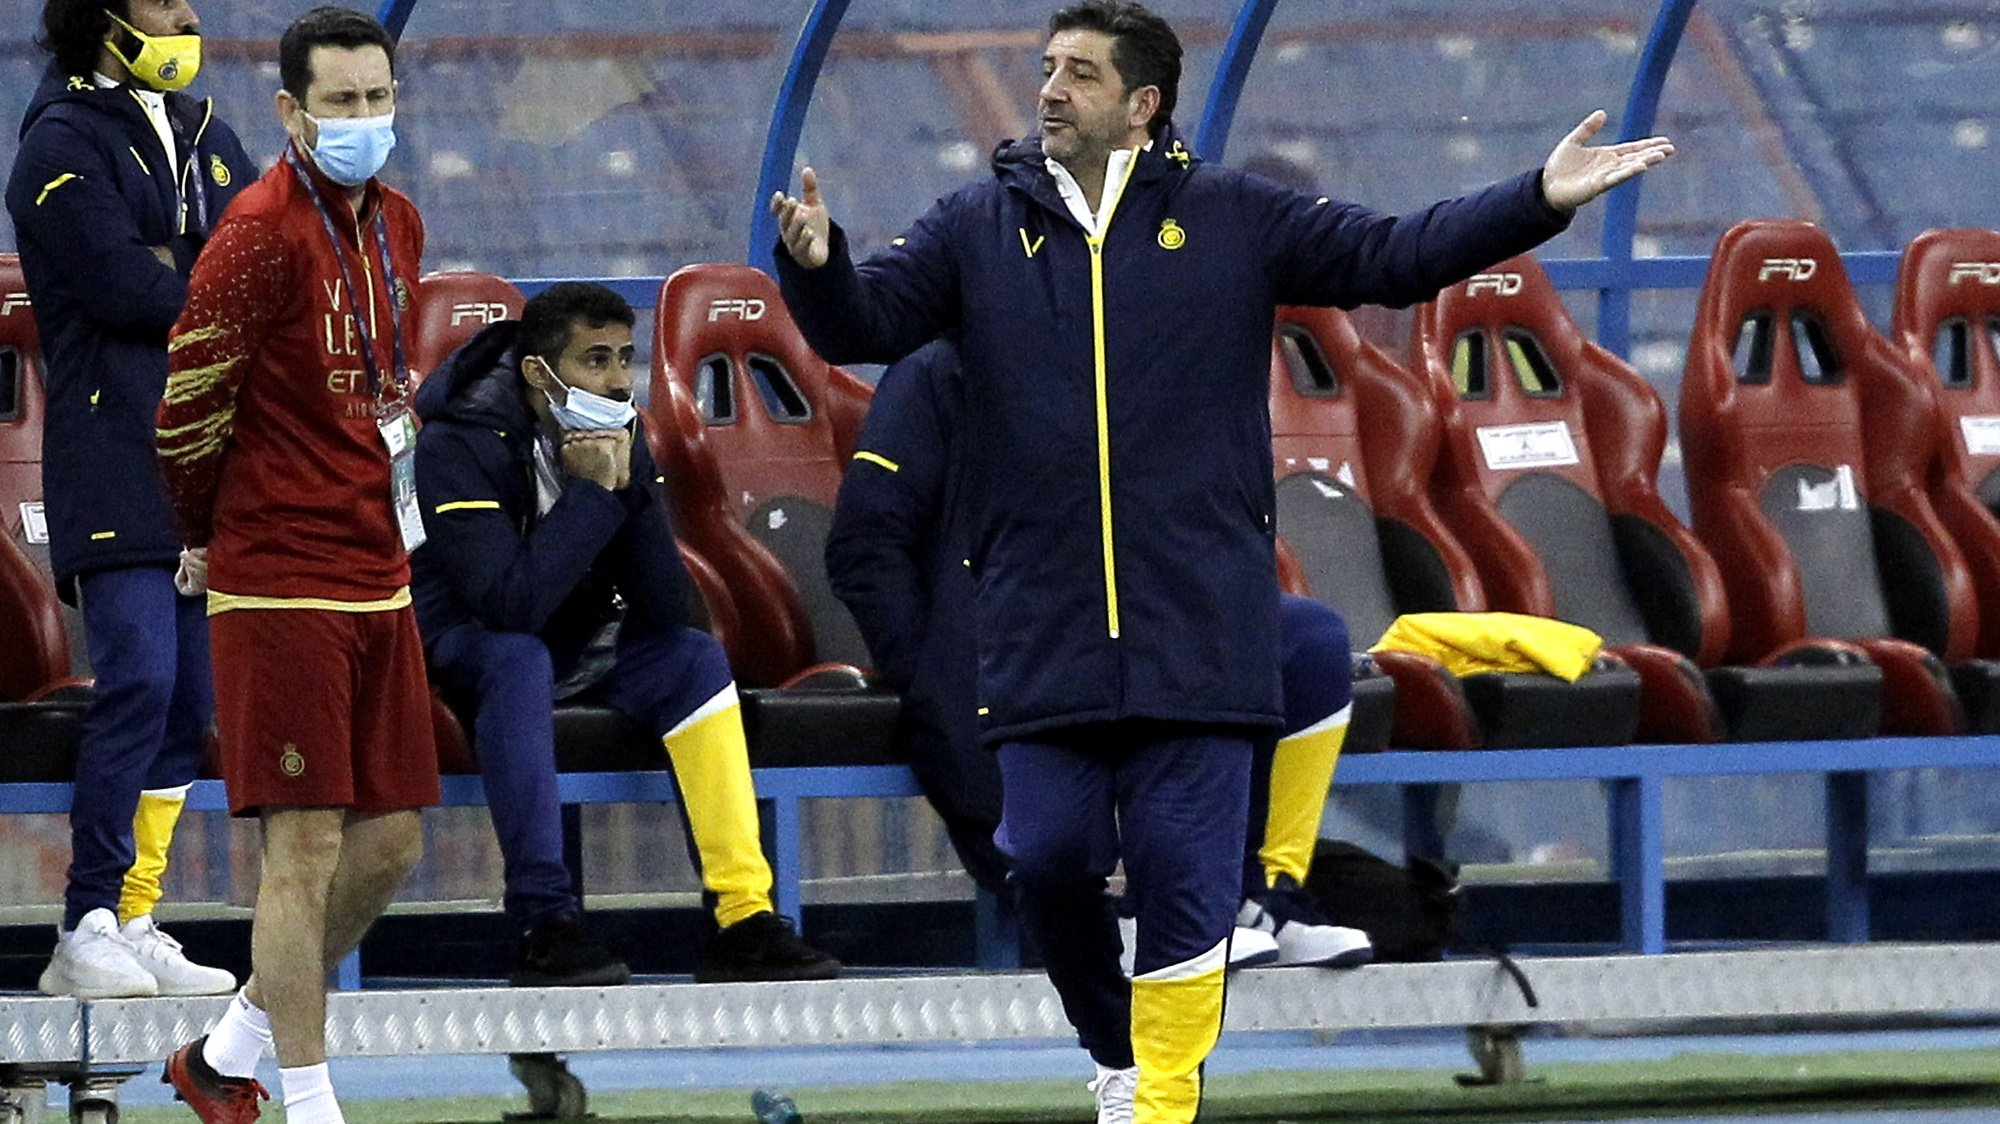 epa08868844 Al-Nassr's coach Rui Vitoria reacts during the Saudi Professional League soccer match between Al-Nassr and Al-Ettifaq at King Fahd International Stadium, in Riyadh, Saudi Arabia, 07 December 2020.  EPA/STR